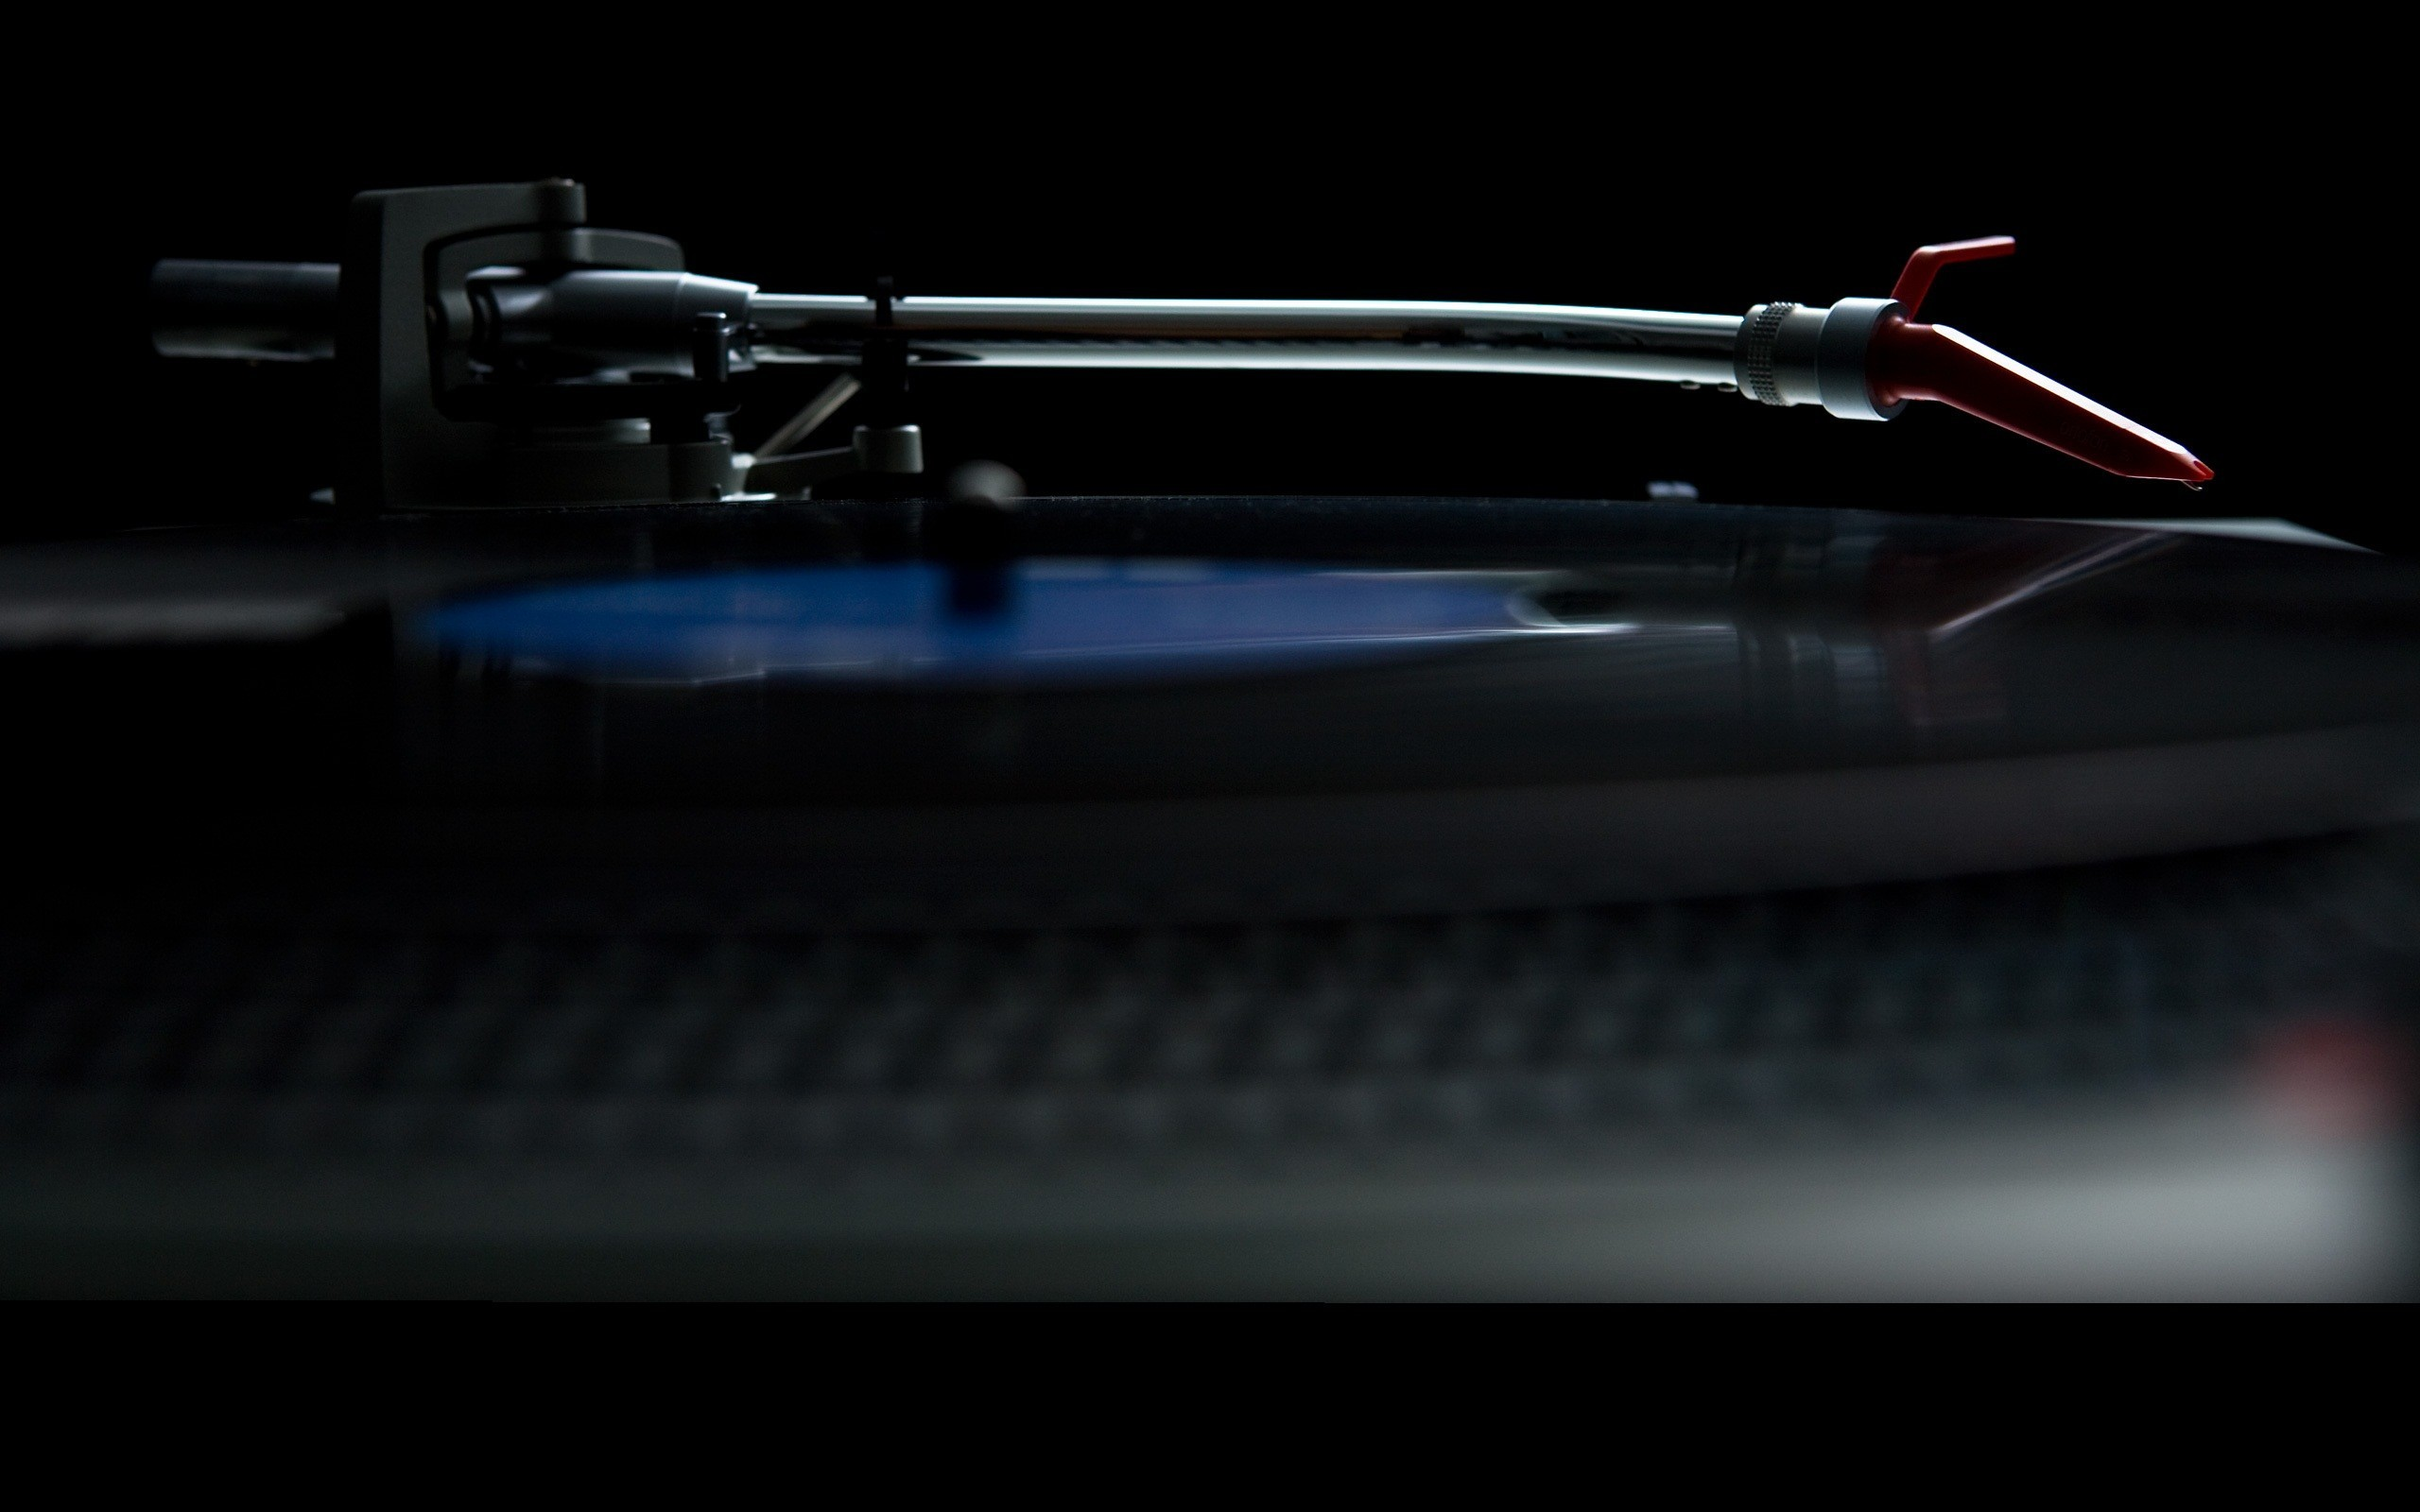 Res: 2560x1600, HD Wallpaper of Black Music Artistic Studio Vinyl Techno Turntables  Technics Dj Fresh New Hd Wallpaper